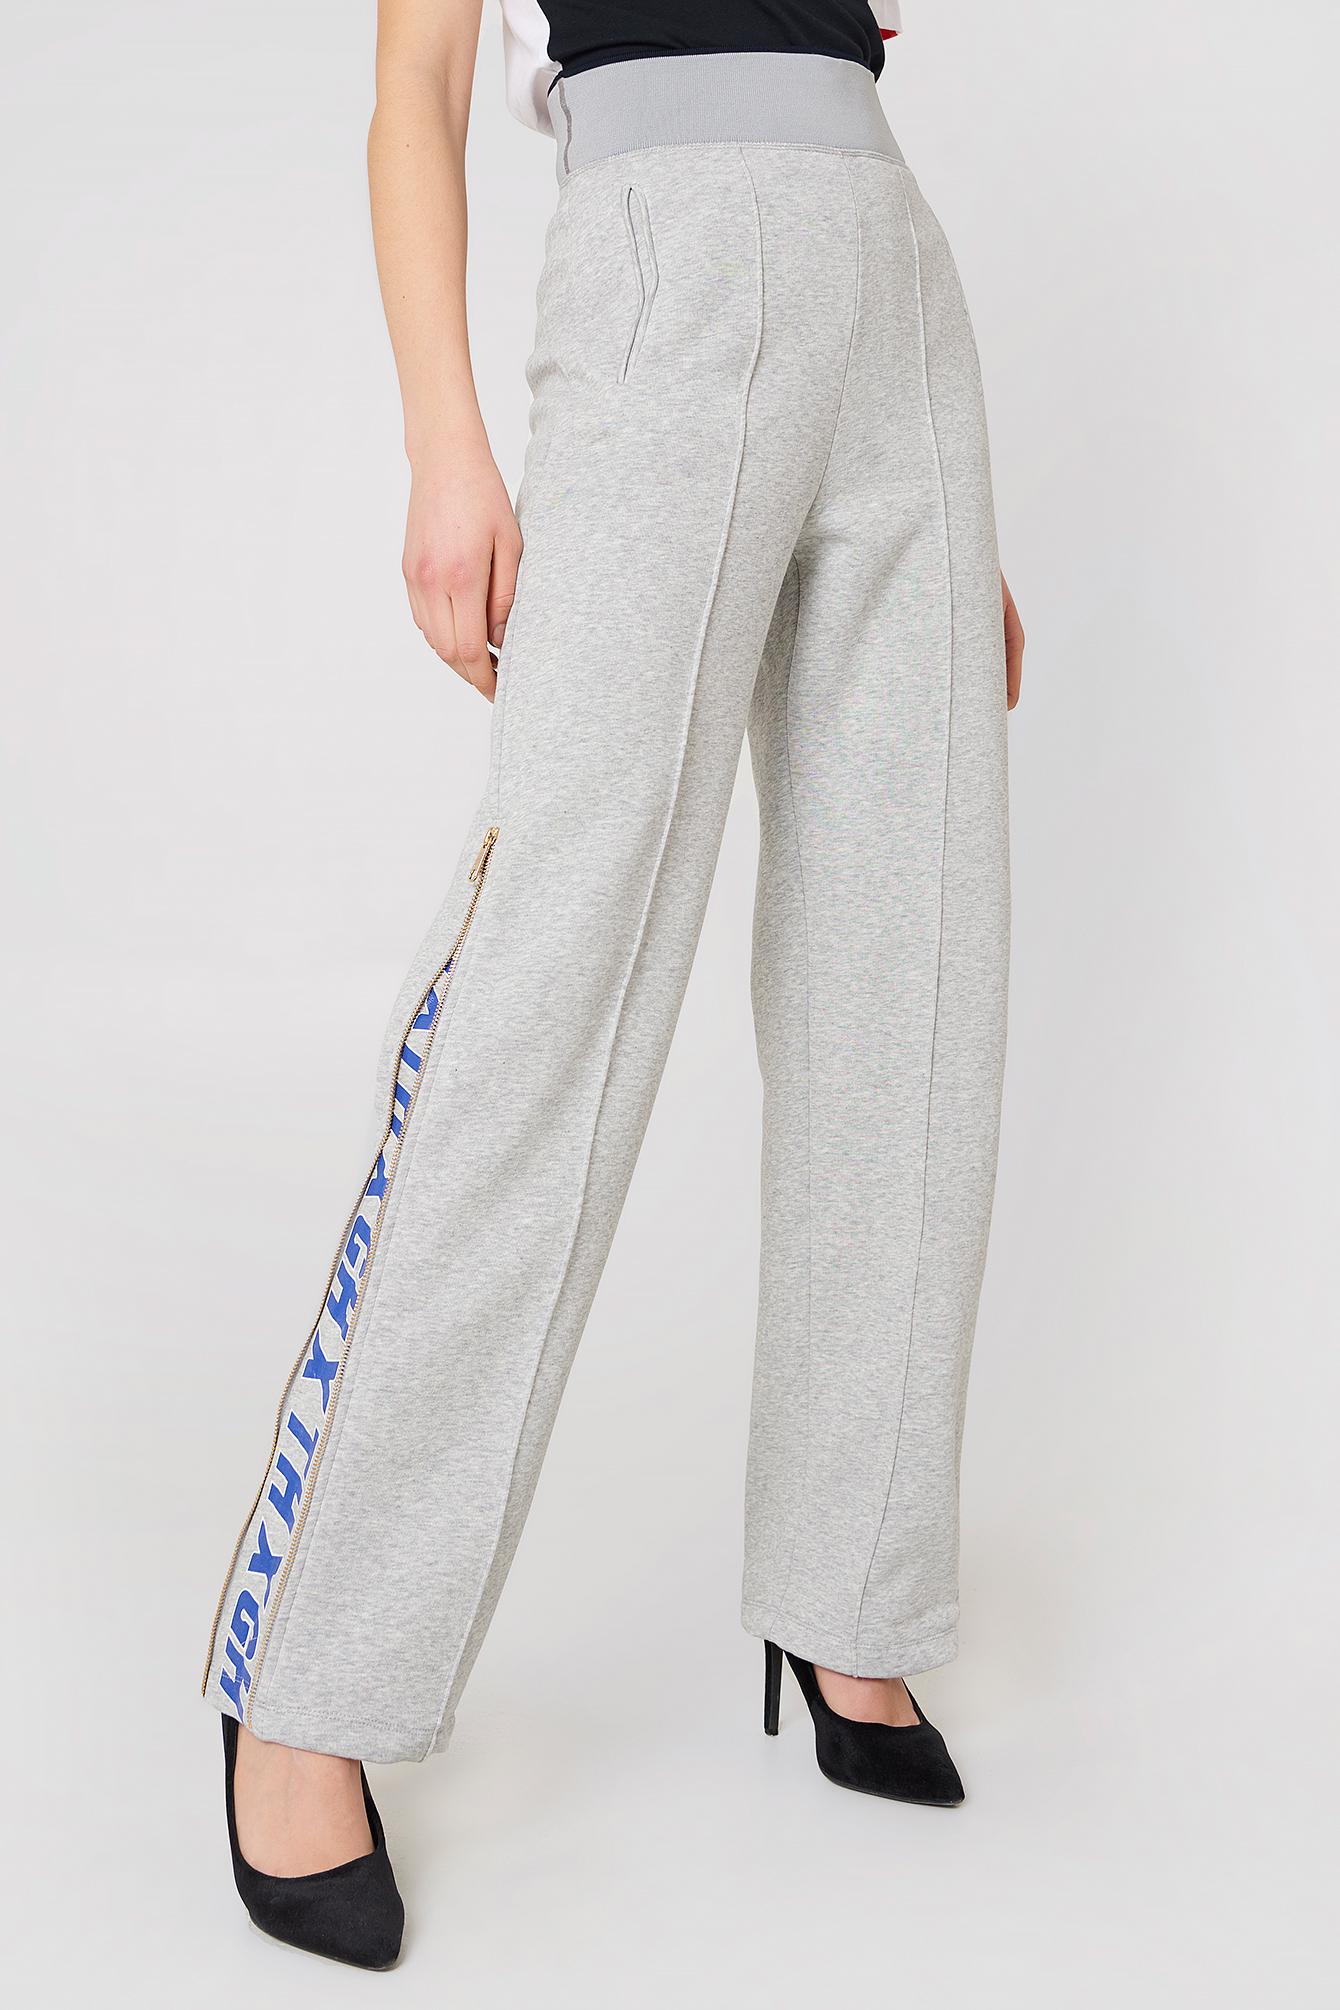 Gigi Hadid Zip Track Pant NA-KD.COM